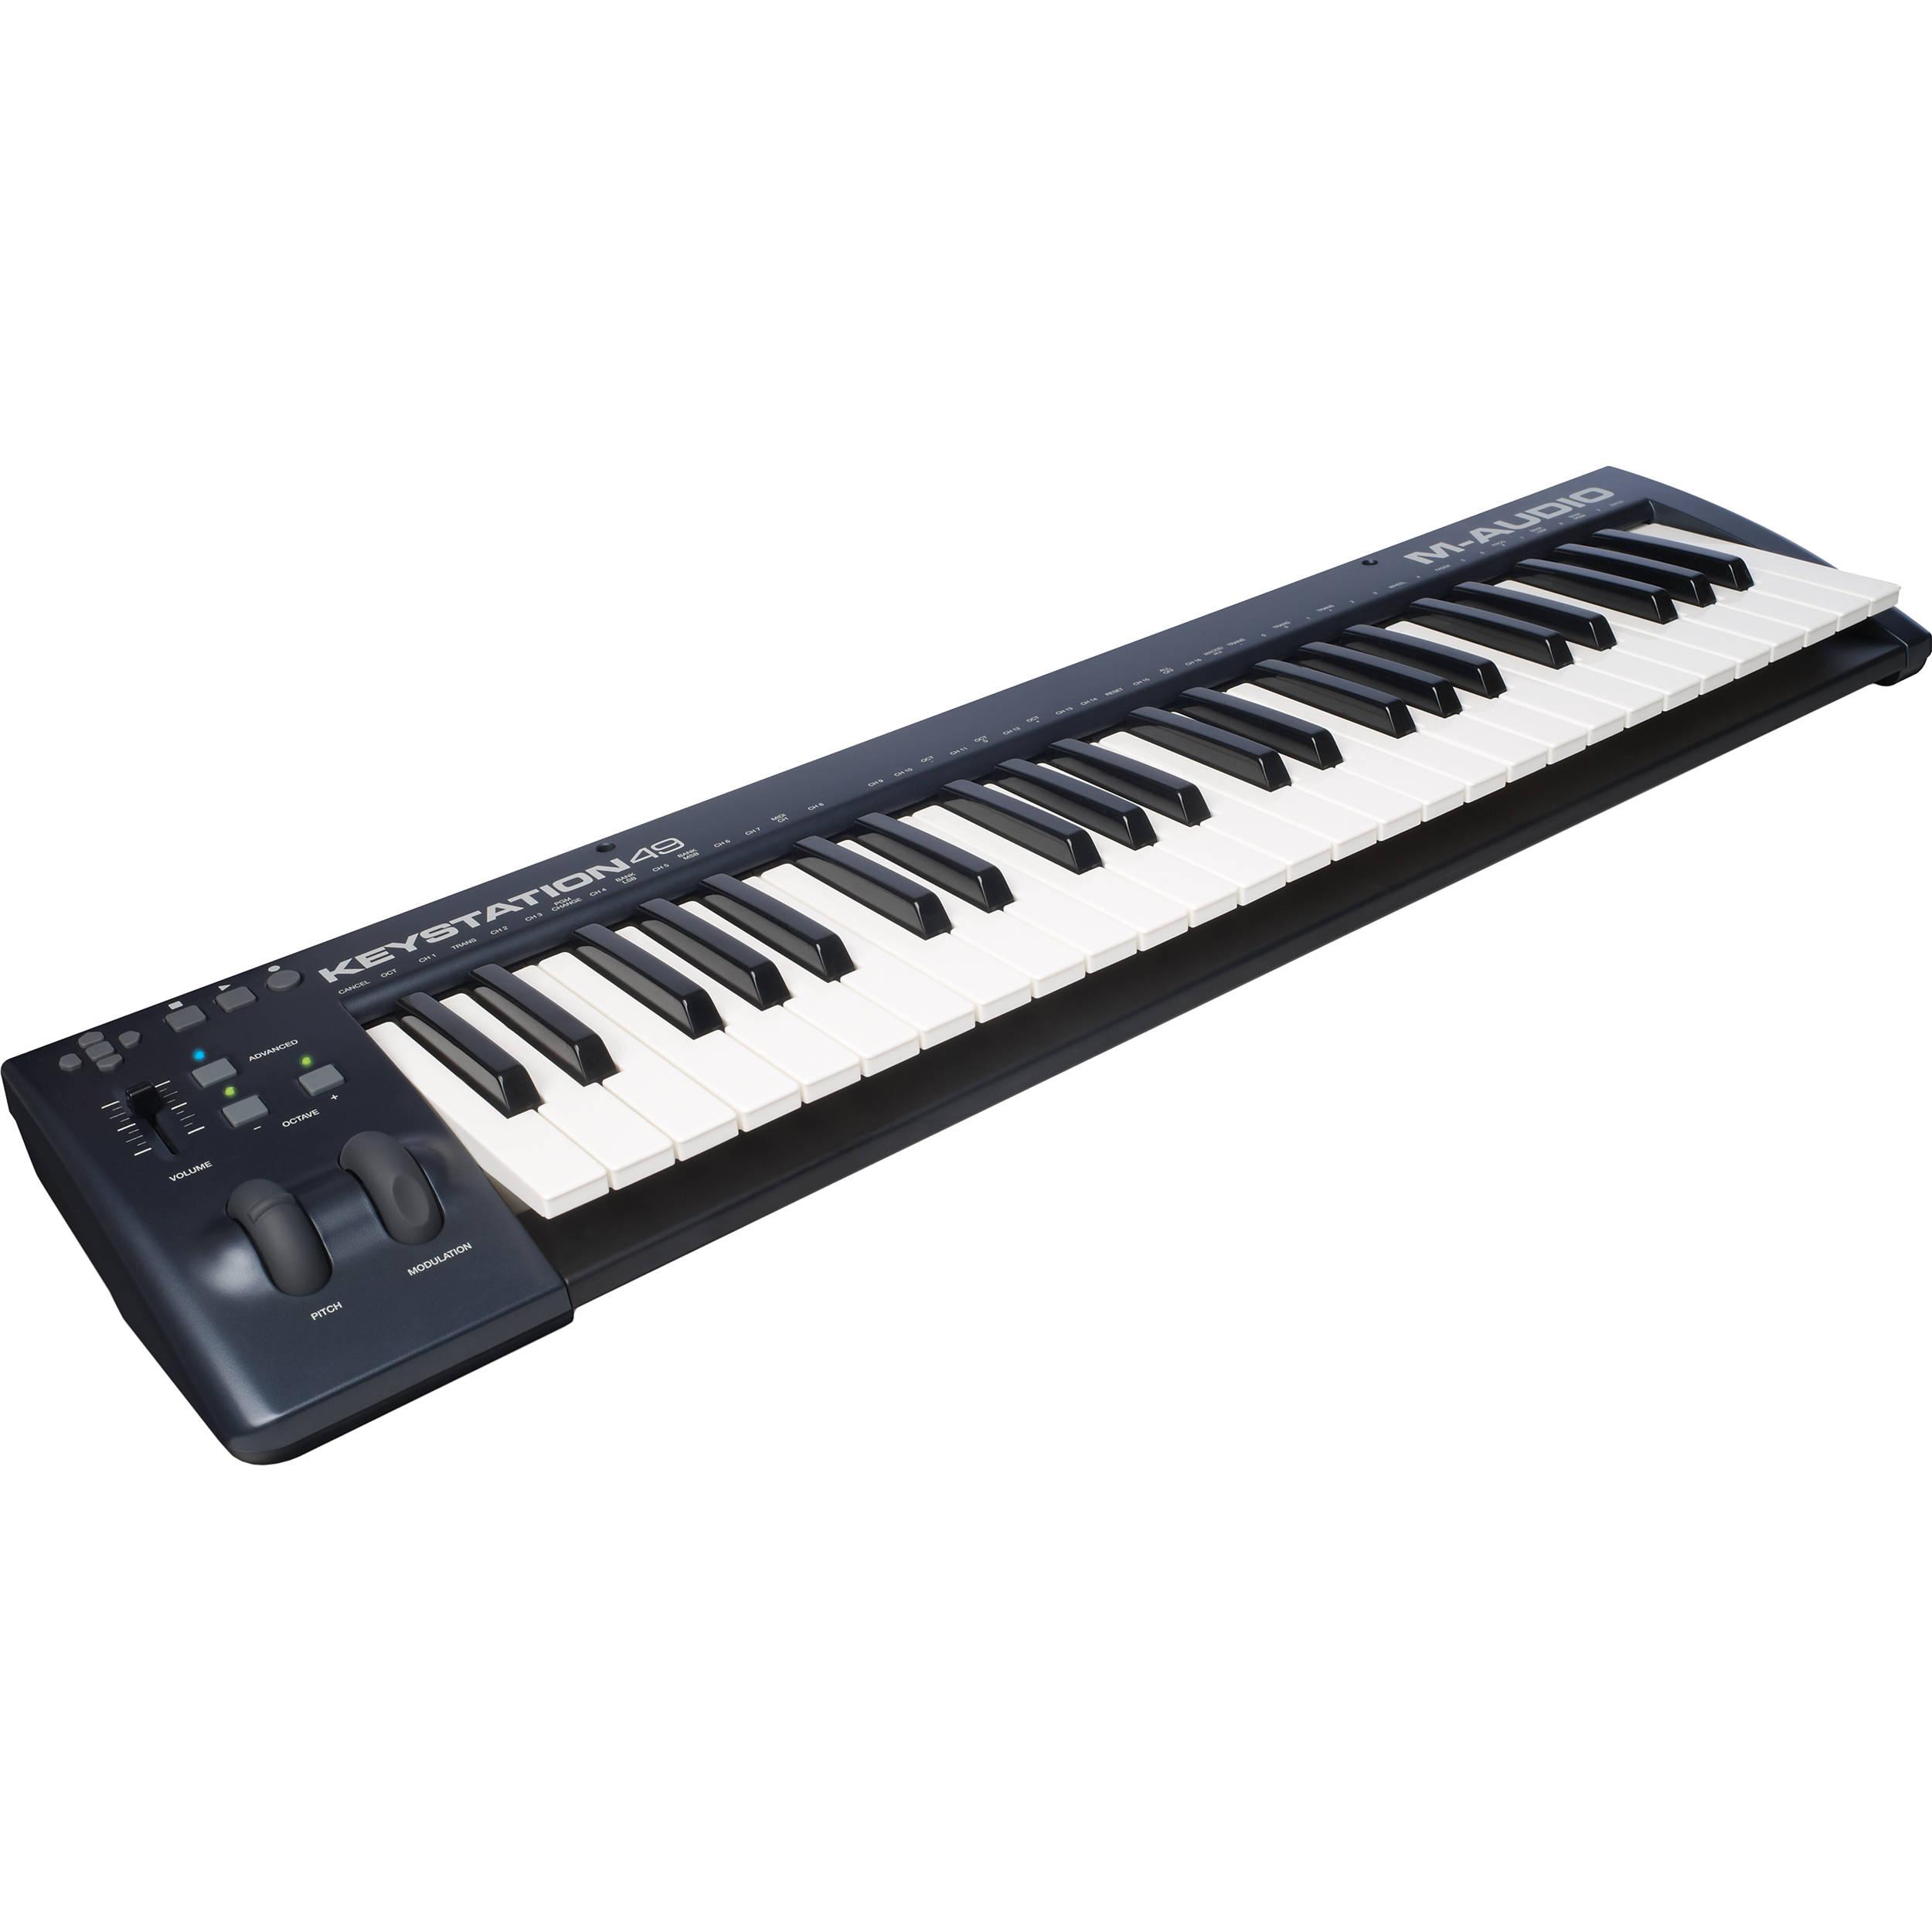 m audio keystation 49 ii midi controller keystation49ii b h. Black Bedroom Furniture Sets. Home Design Ideas